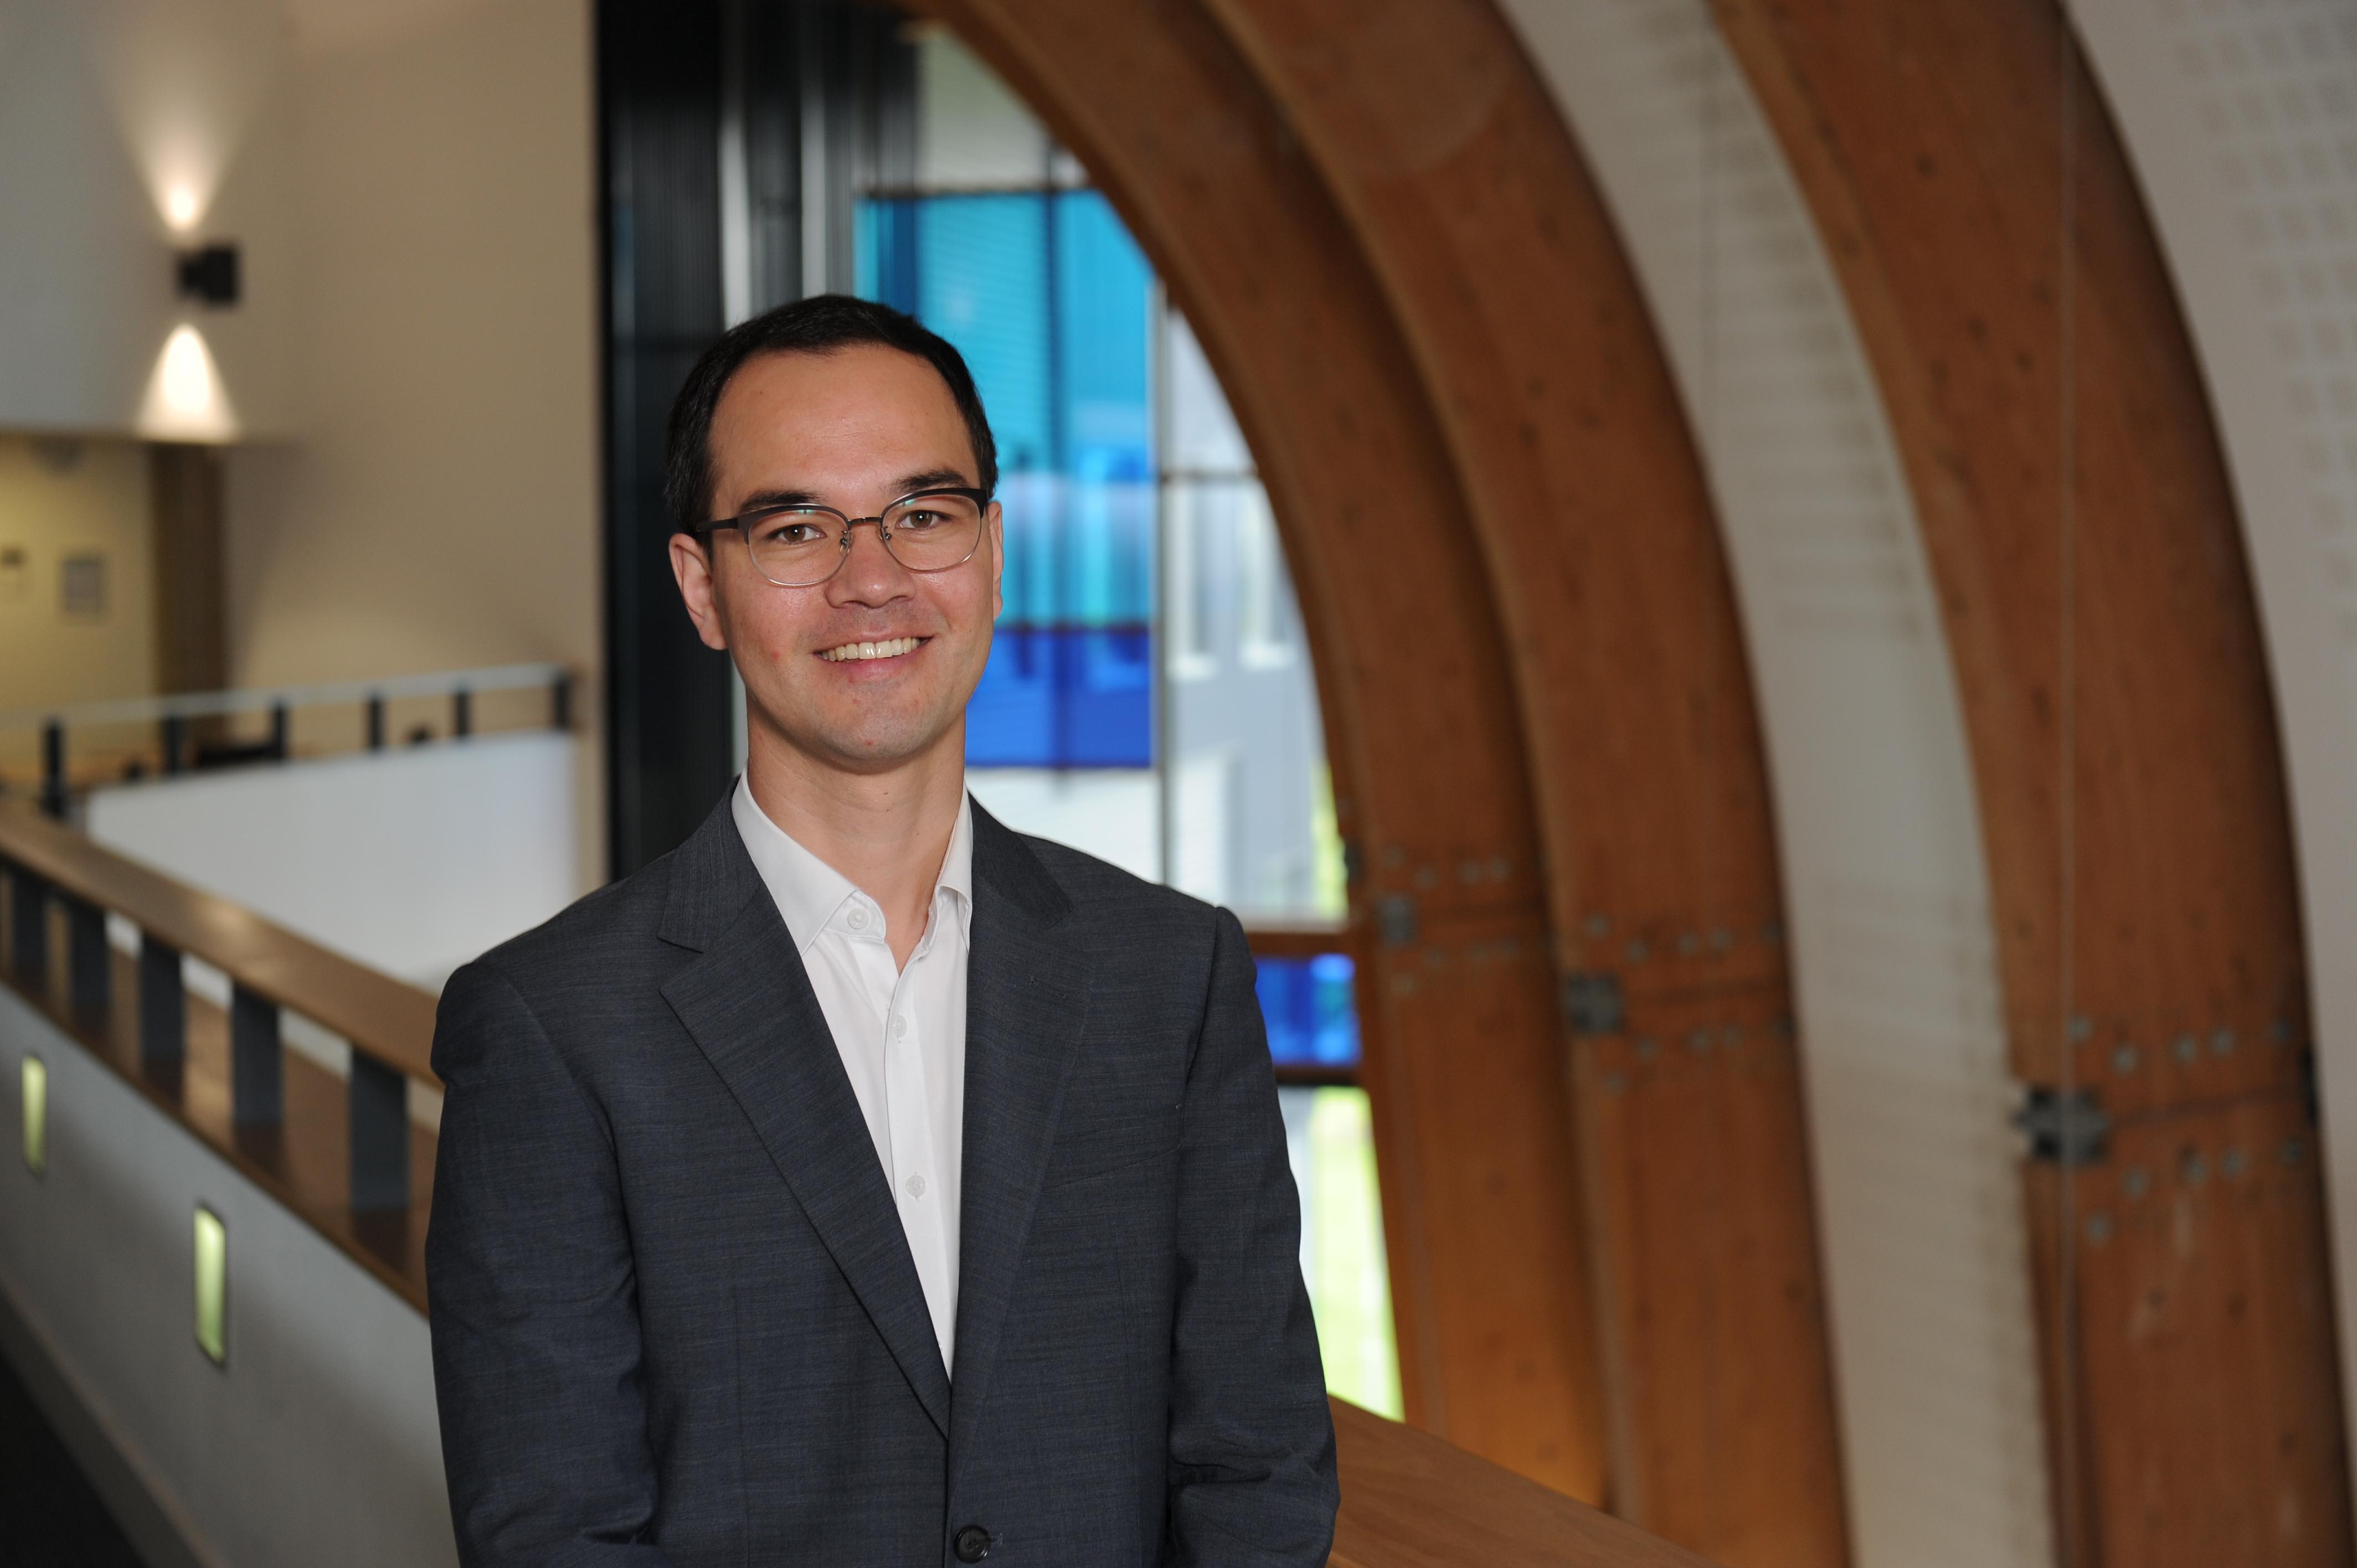 Dr Stephan Gerschewski